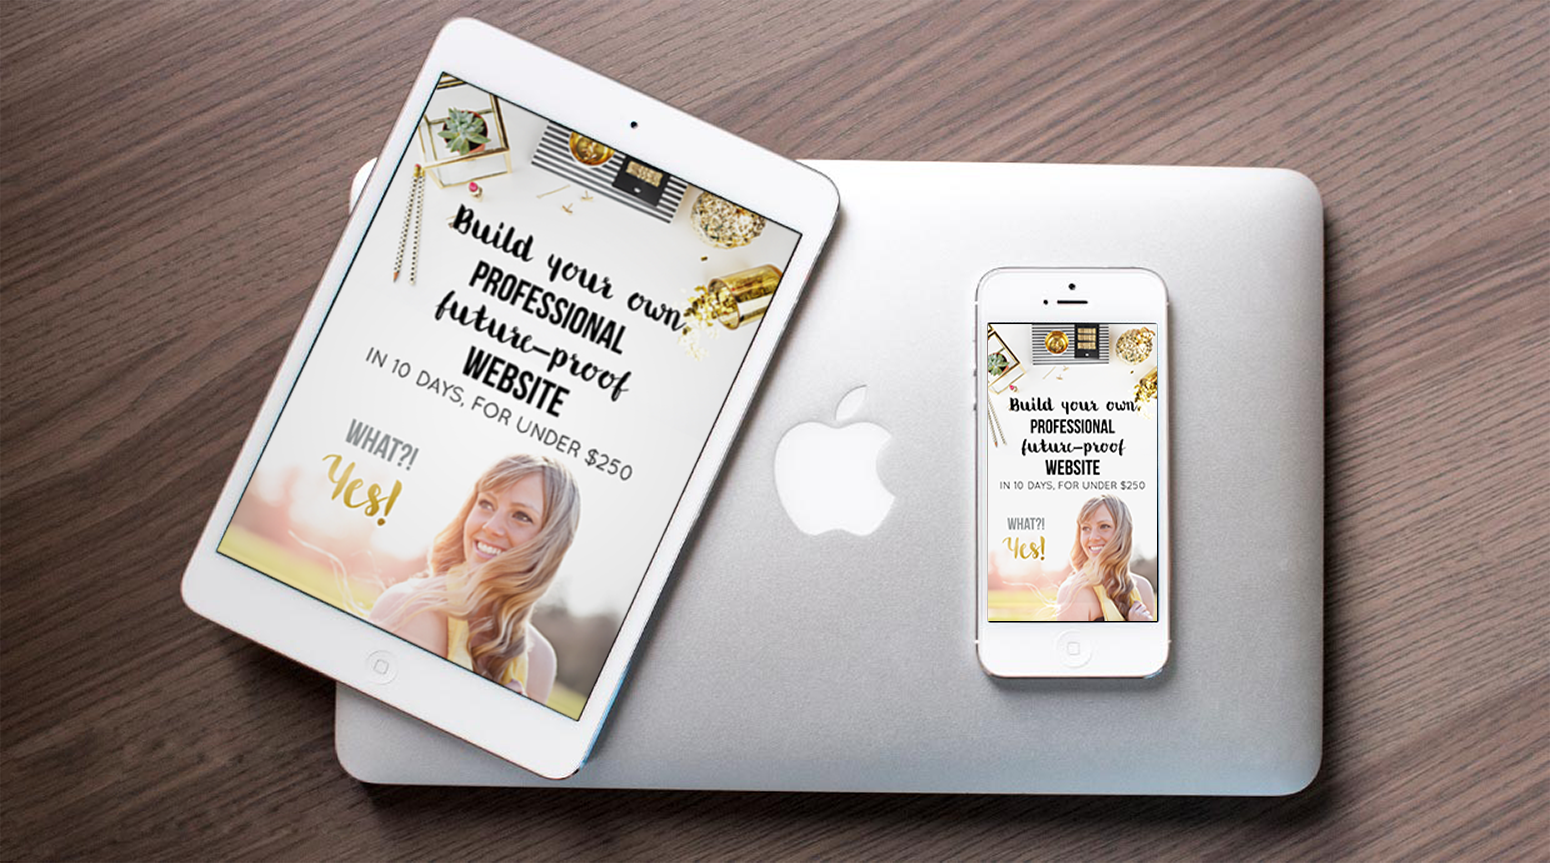 build your own website - 2